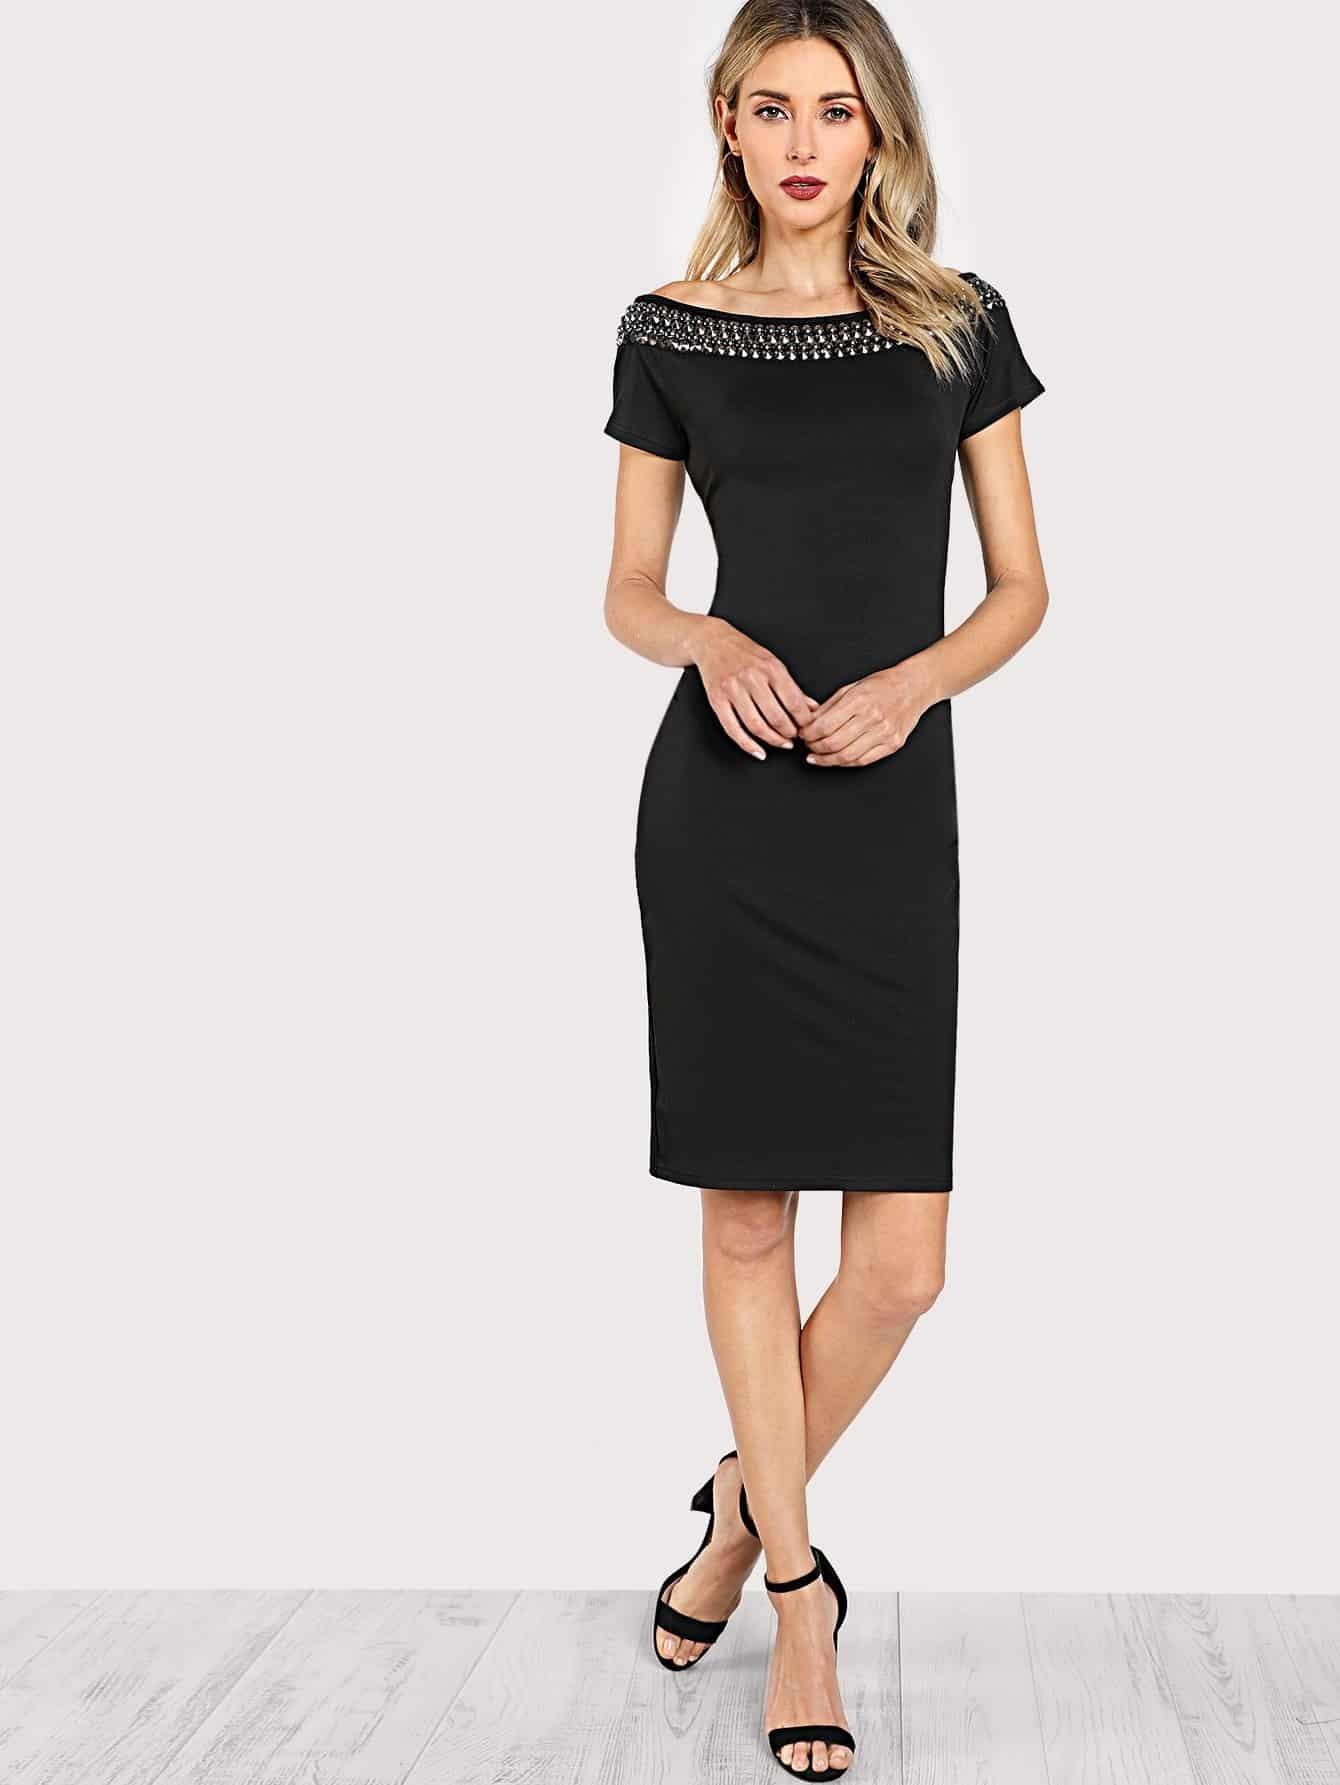 Studded Embellished Neck Form Fitting Dress metallic form fitting dress